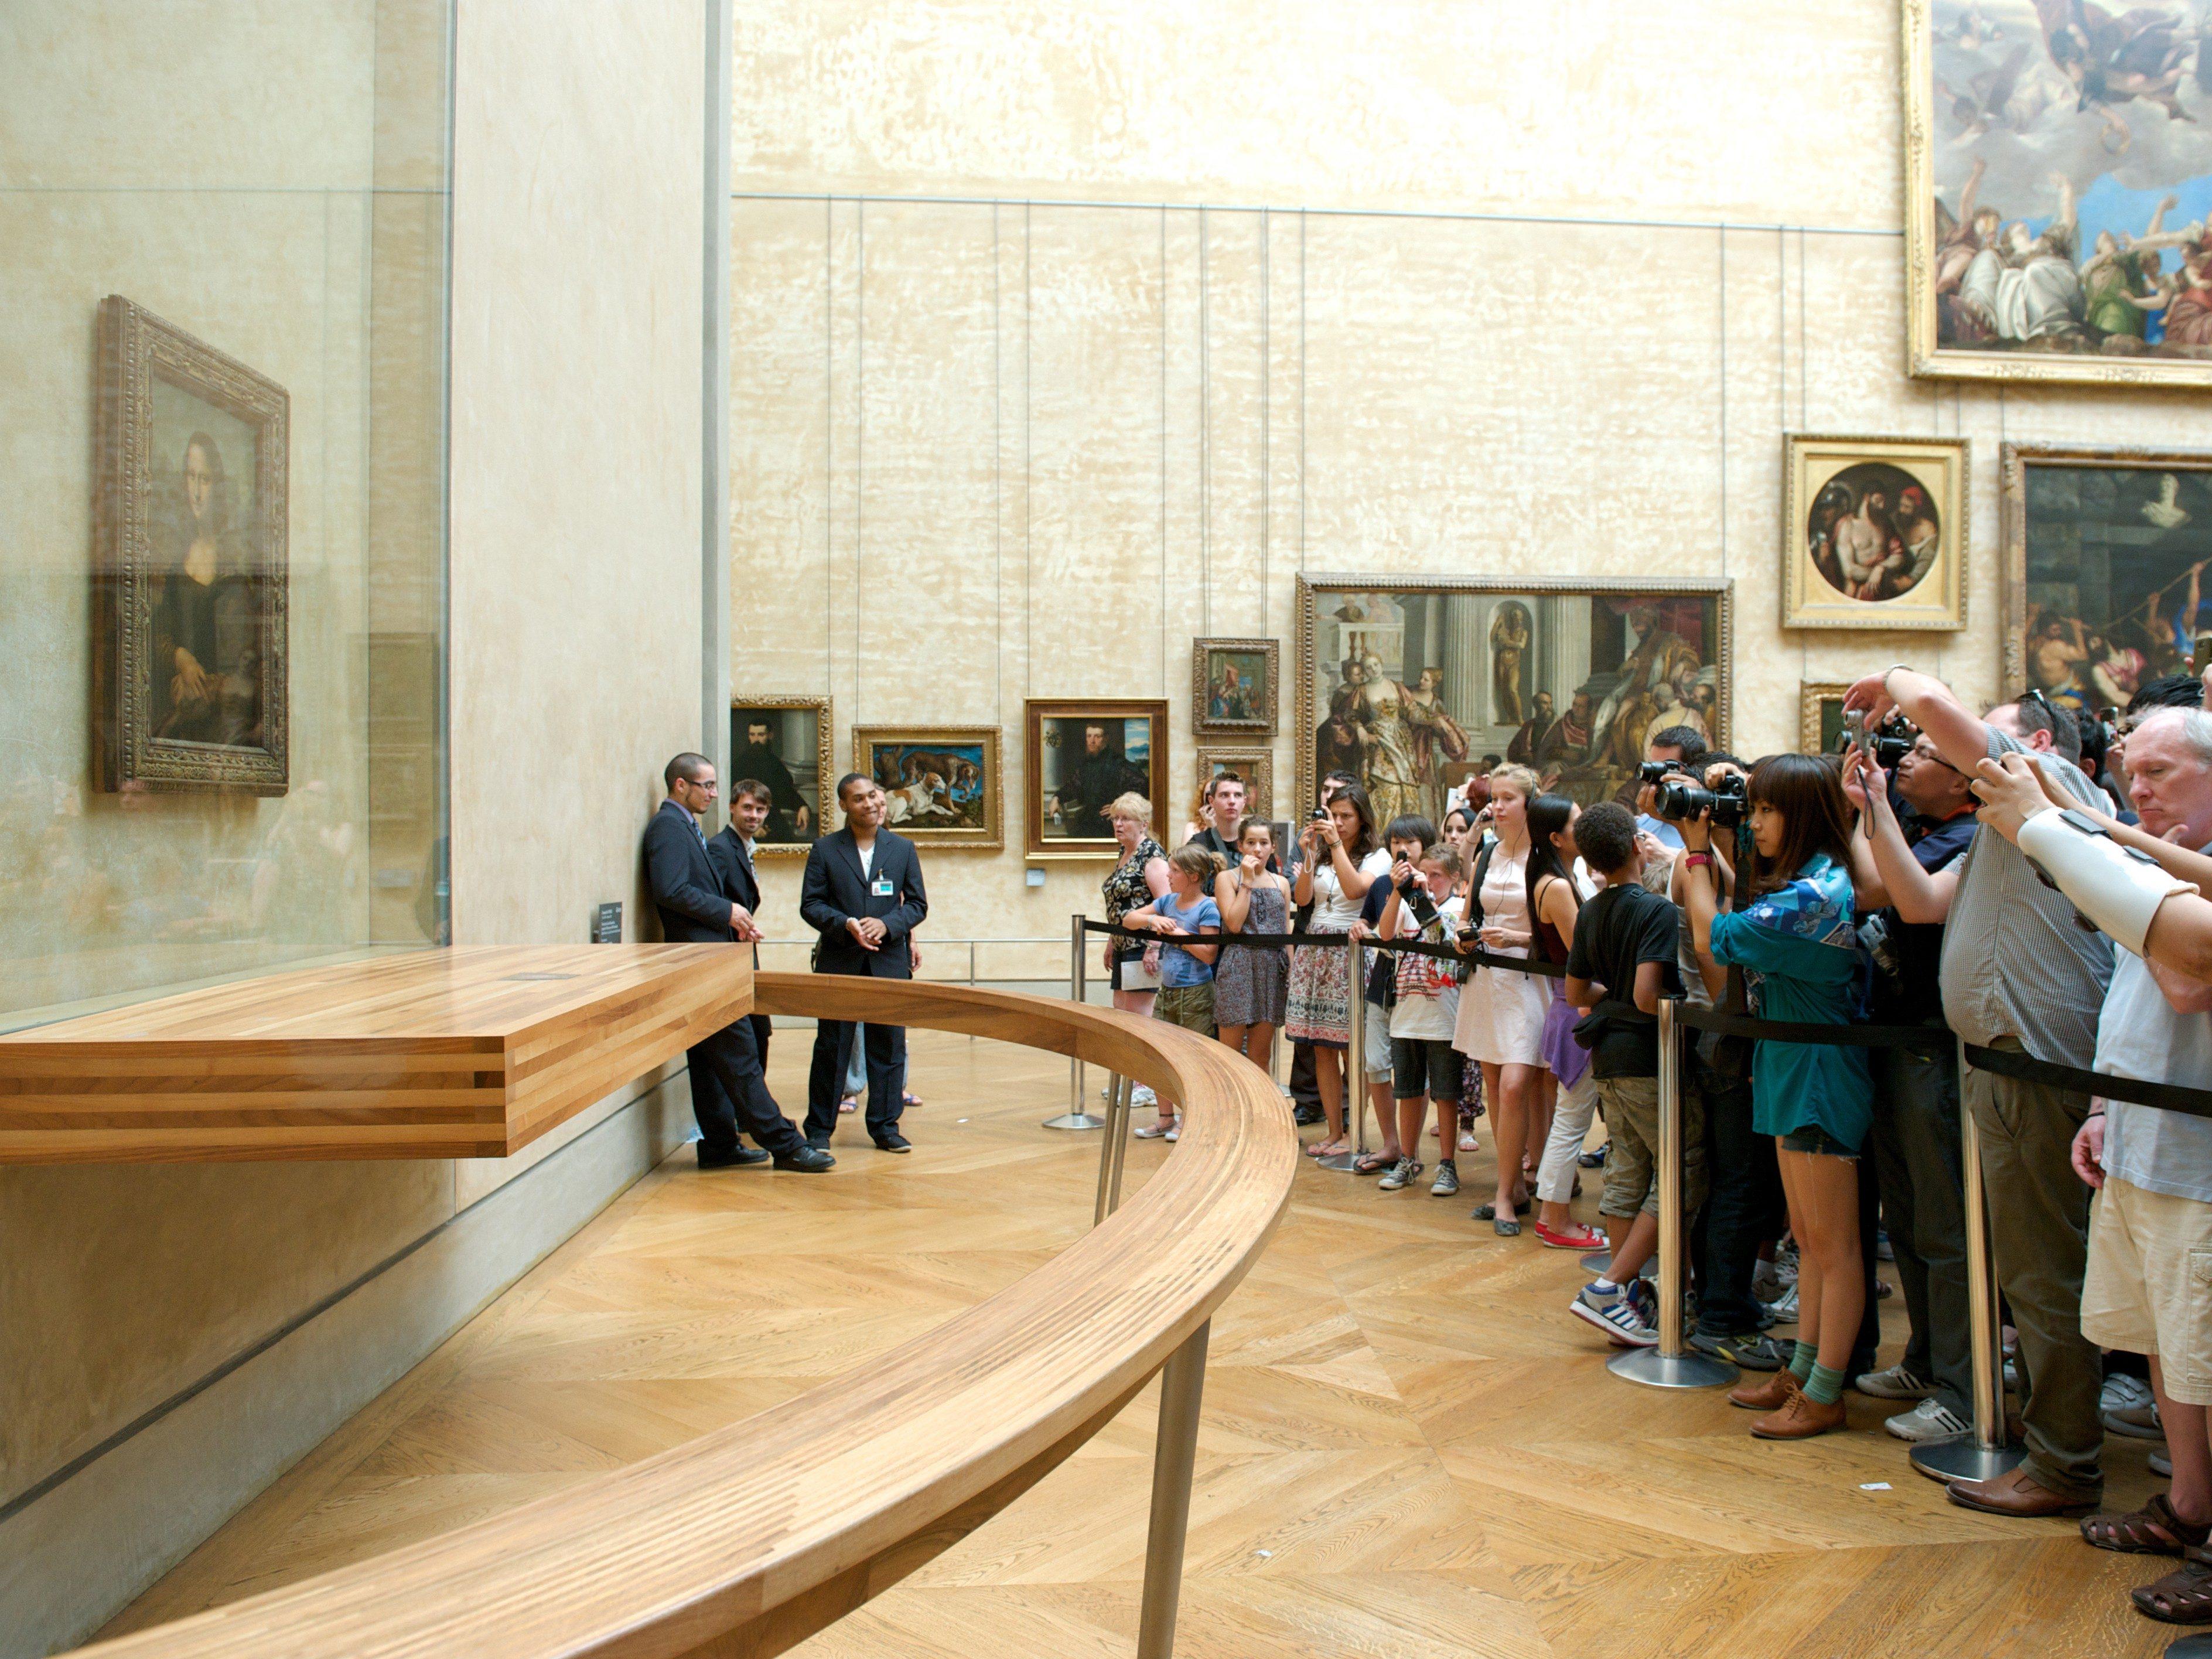 Mona Lisa mystery #2: The hidden initials.